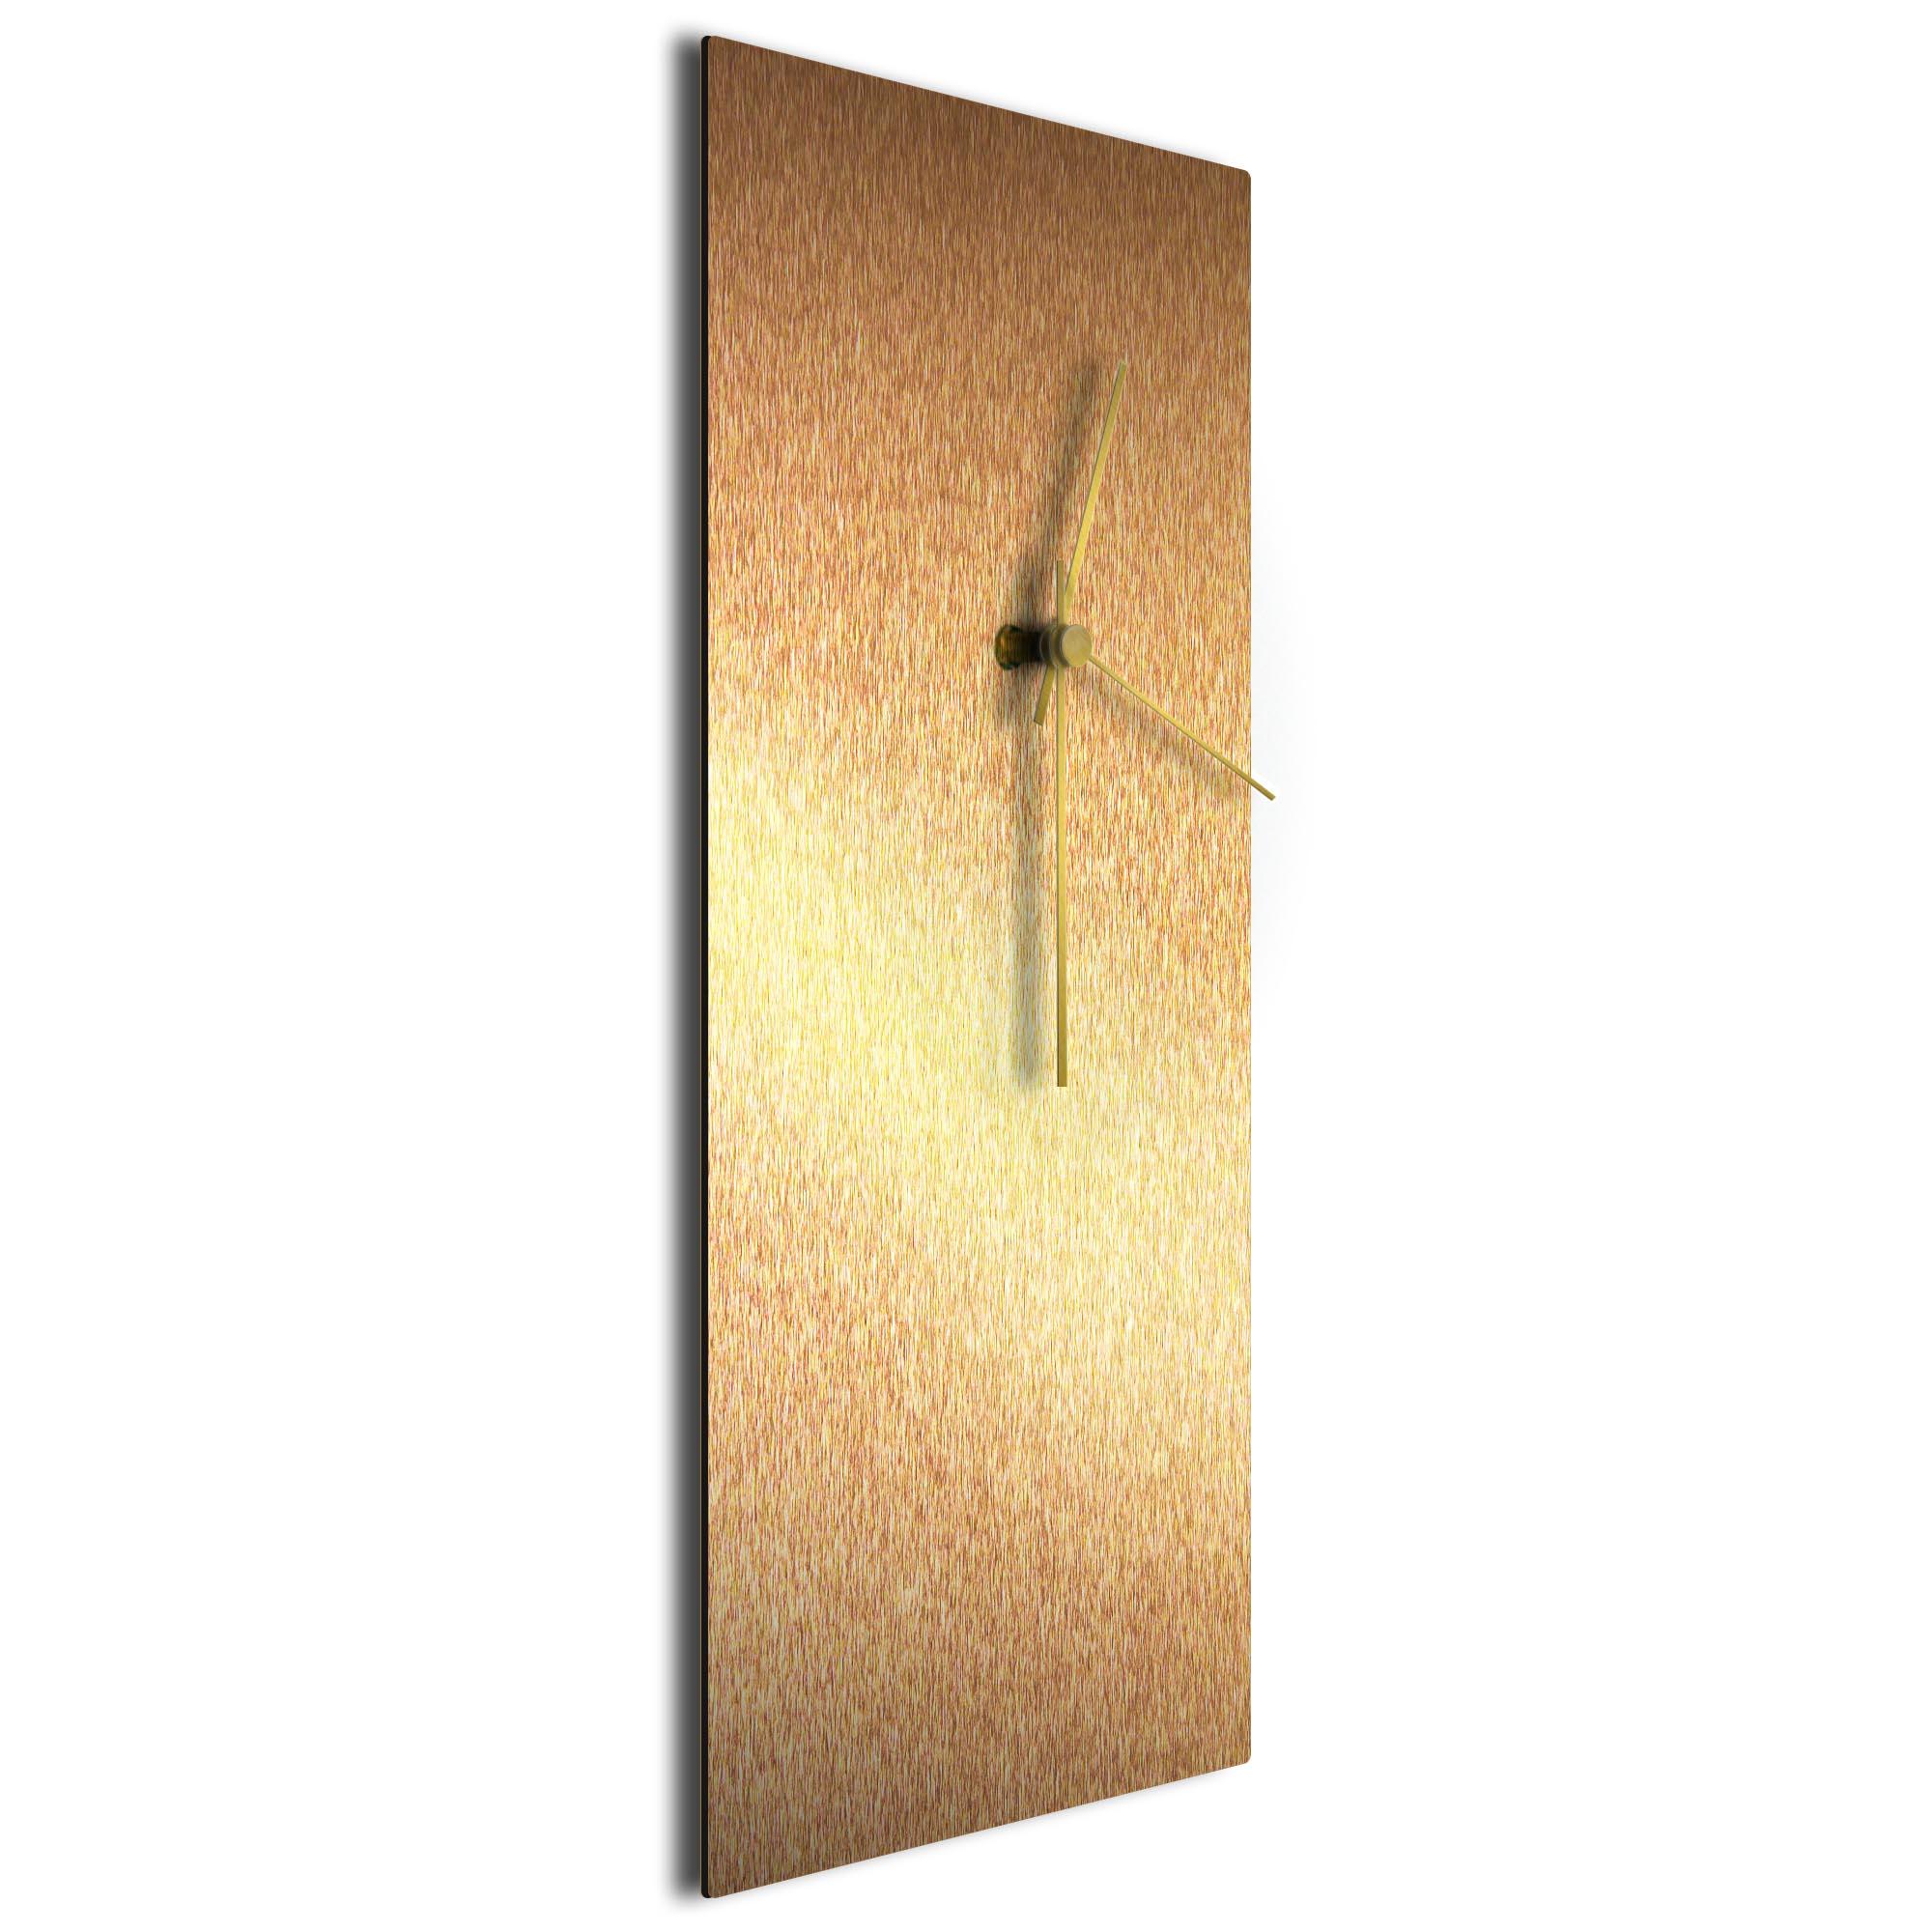 Bronzesmith Clock Large Gold - Image 2